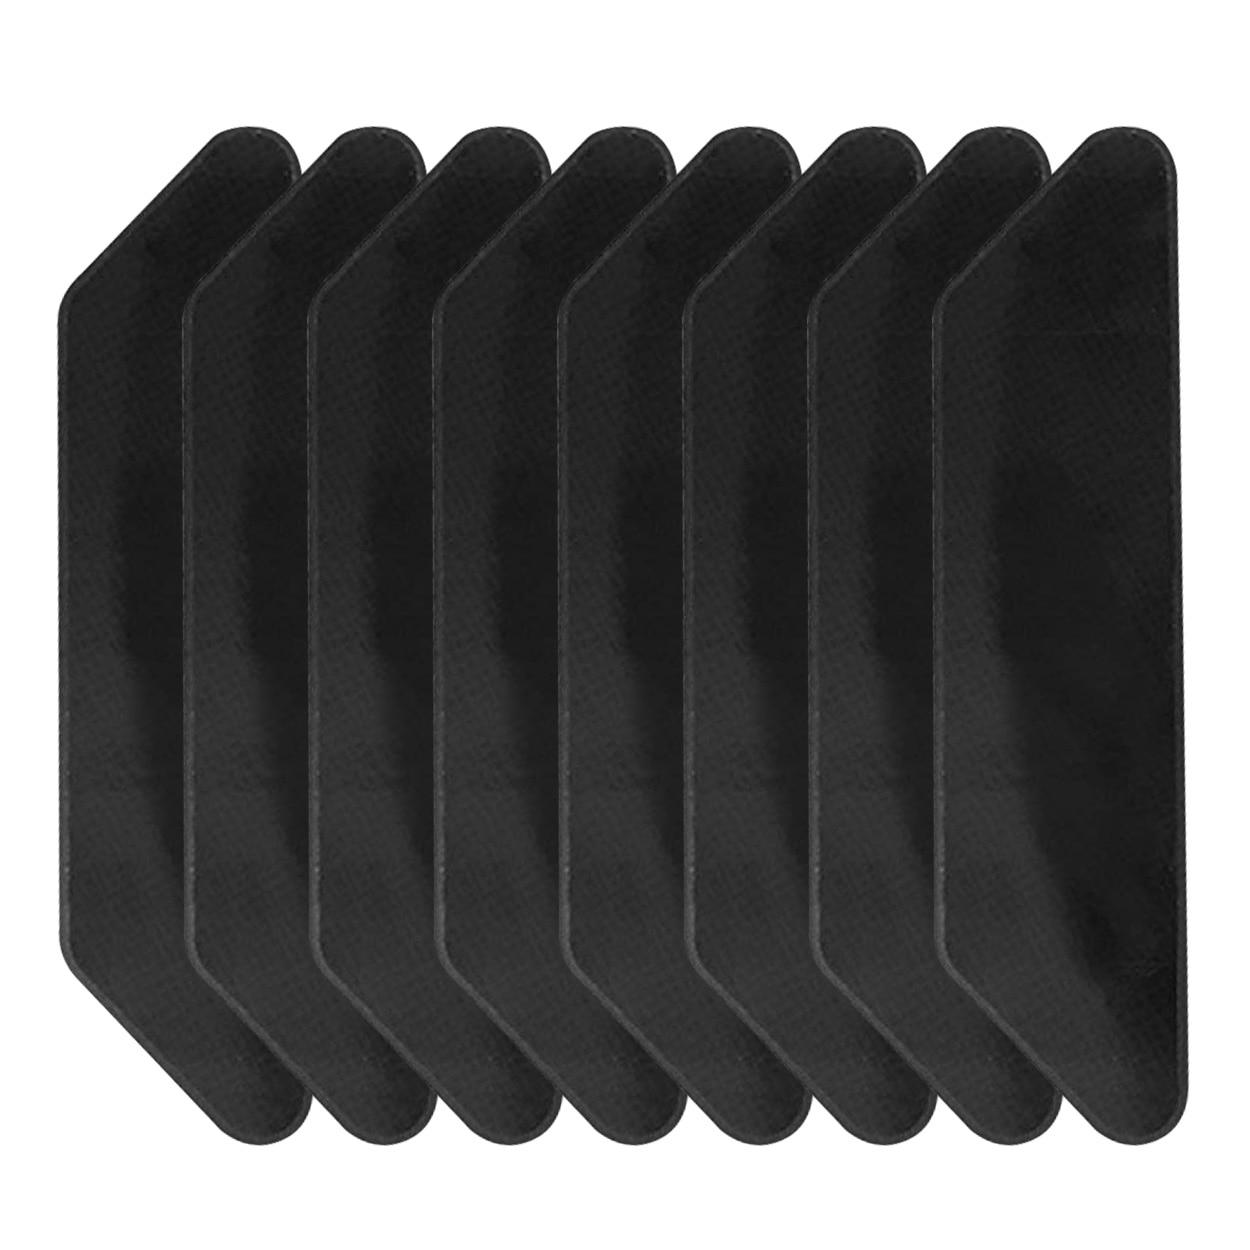 8Pcs/Set Reusable Rug Sticker Carpet Pad Grip Floor Anti Skid Tape MDJ998